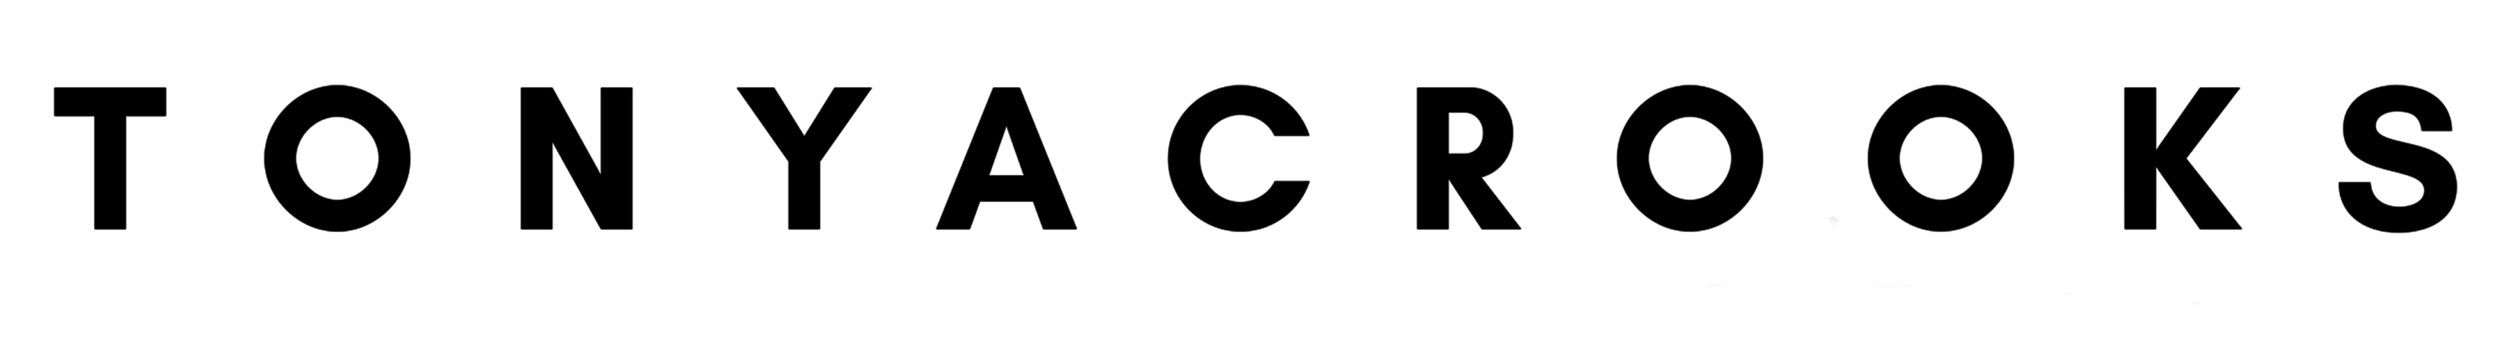 tonya crooks name logo.png